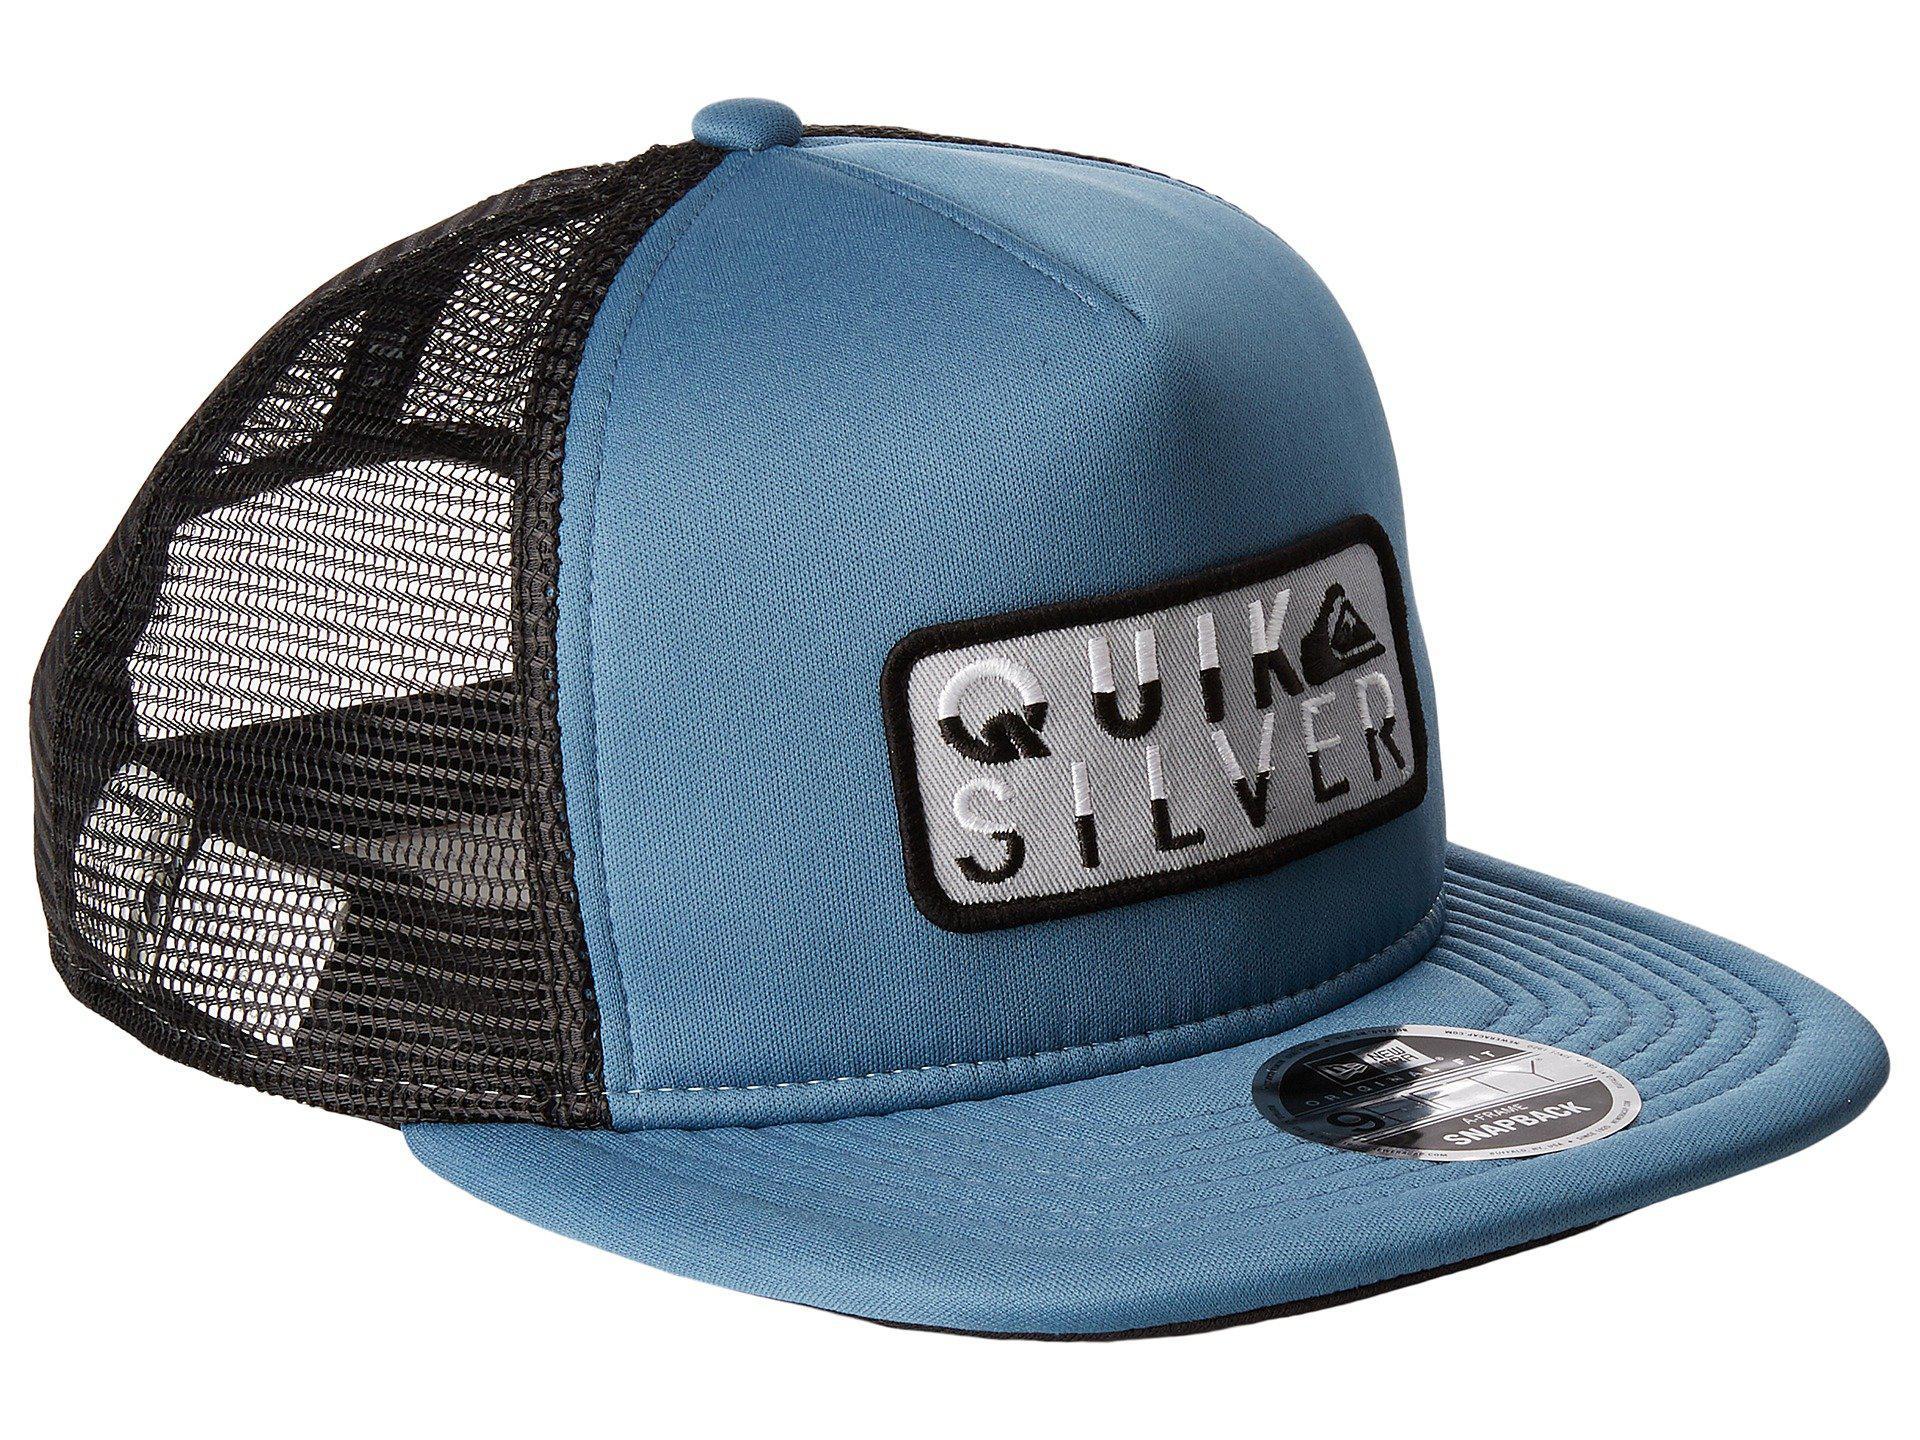 a090e5b40fa4b Lyst - Quiksilver Slide Rider Hat for Men